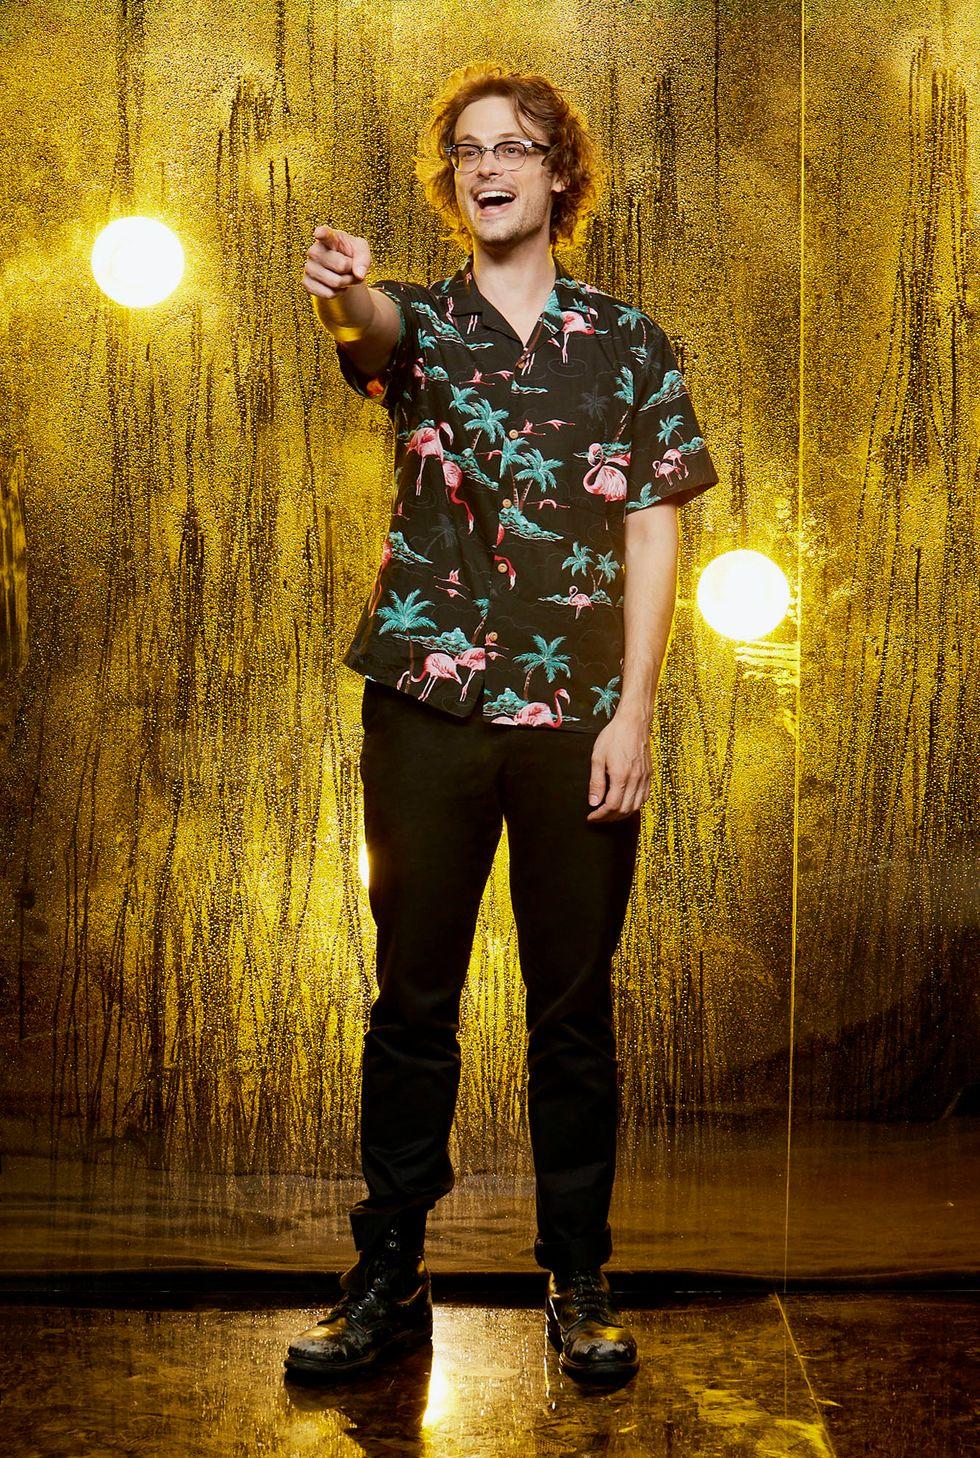 Matthew Gray Gubler of Criminal Minds in Hawaiian shirt and glasses